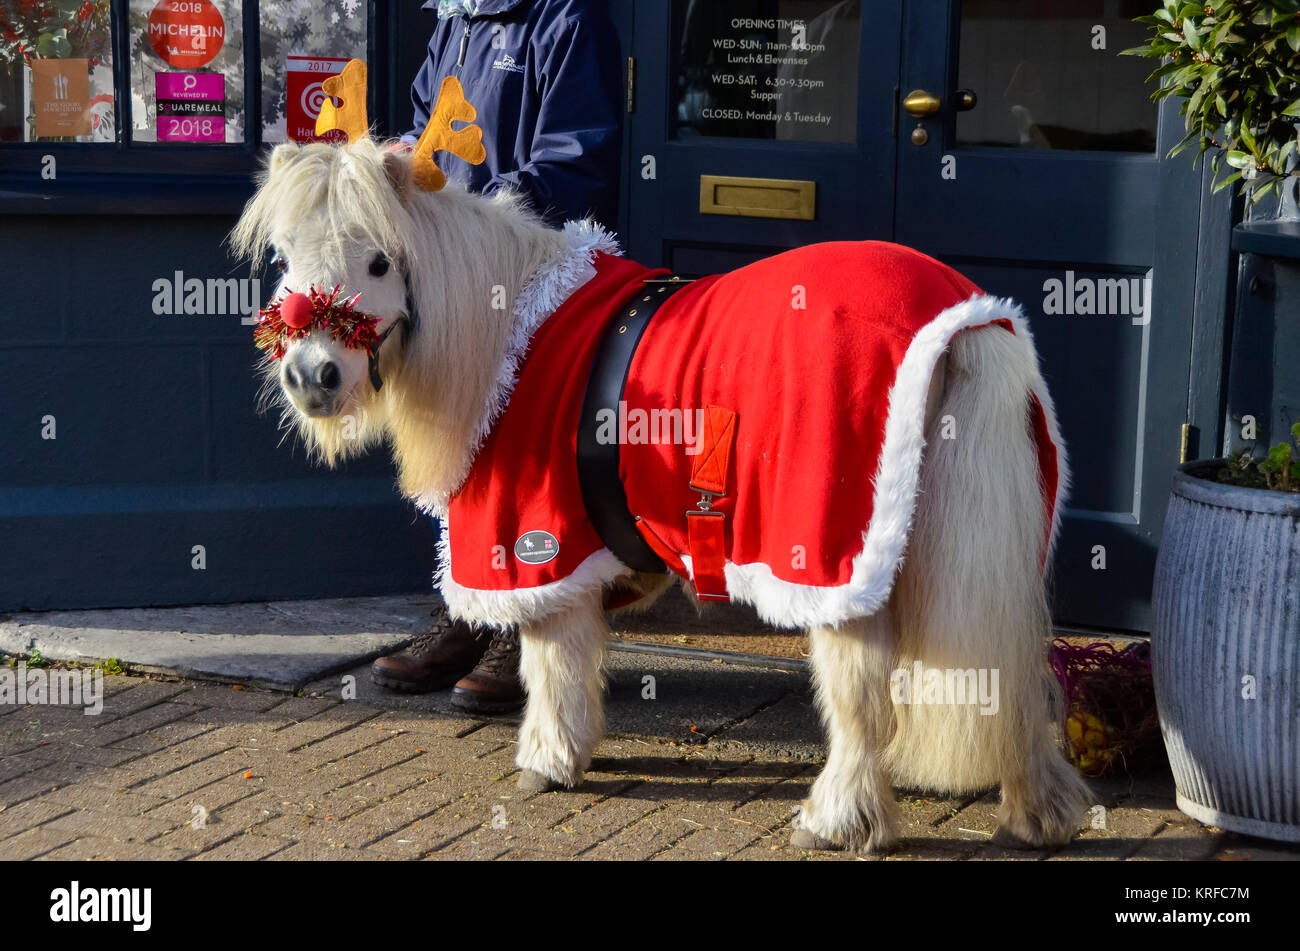 Beaminster, Dorset, UK.  19th December 2017.   A Ferne Animal Sanctuary Shetland pony at Beaminster in Dorset adorned - Stock Image